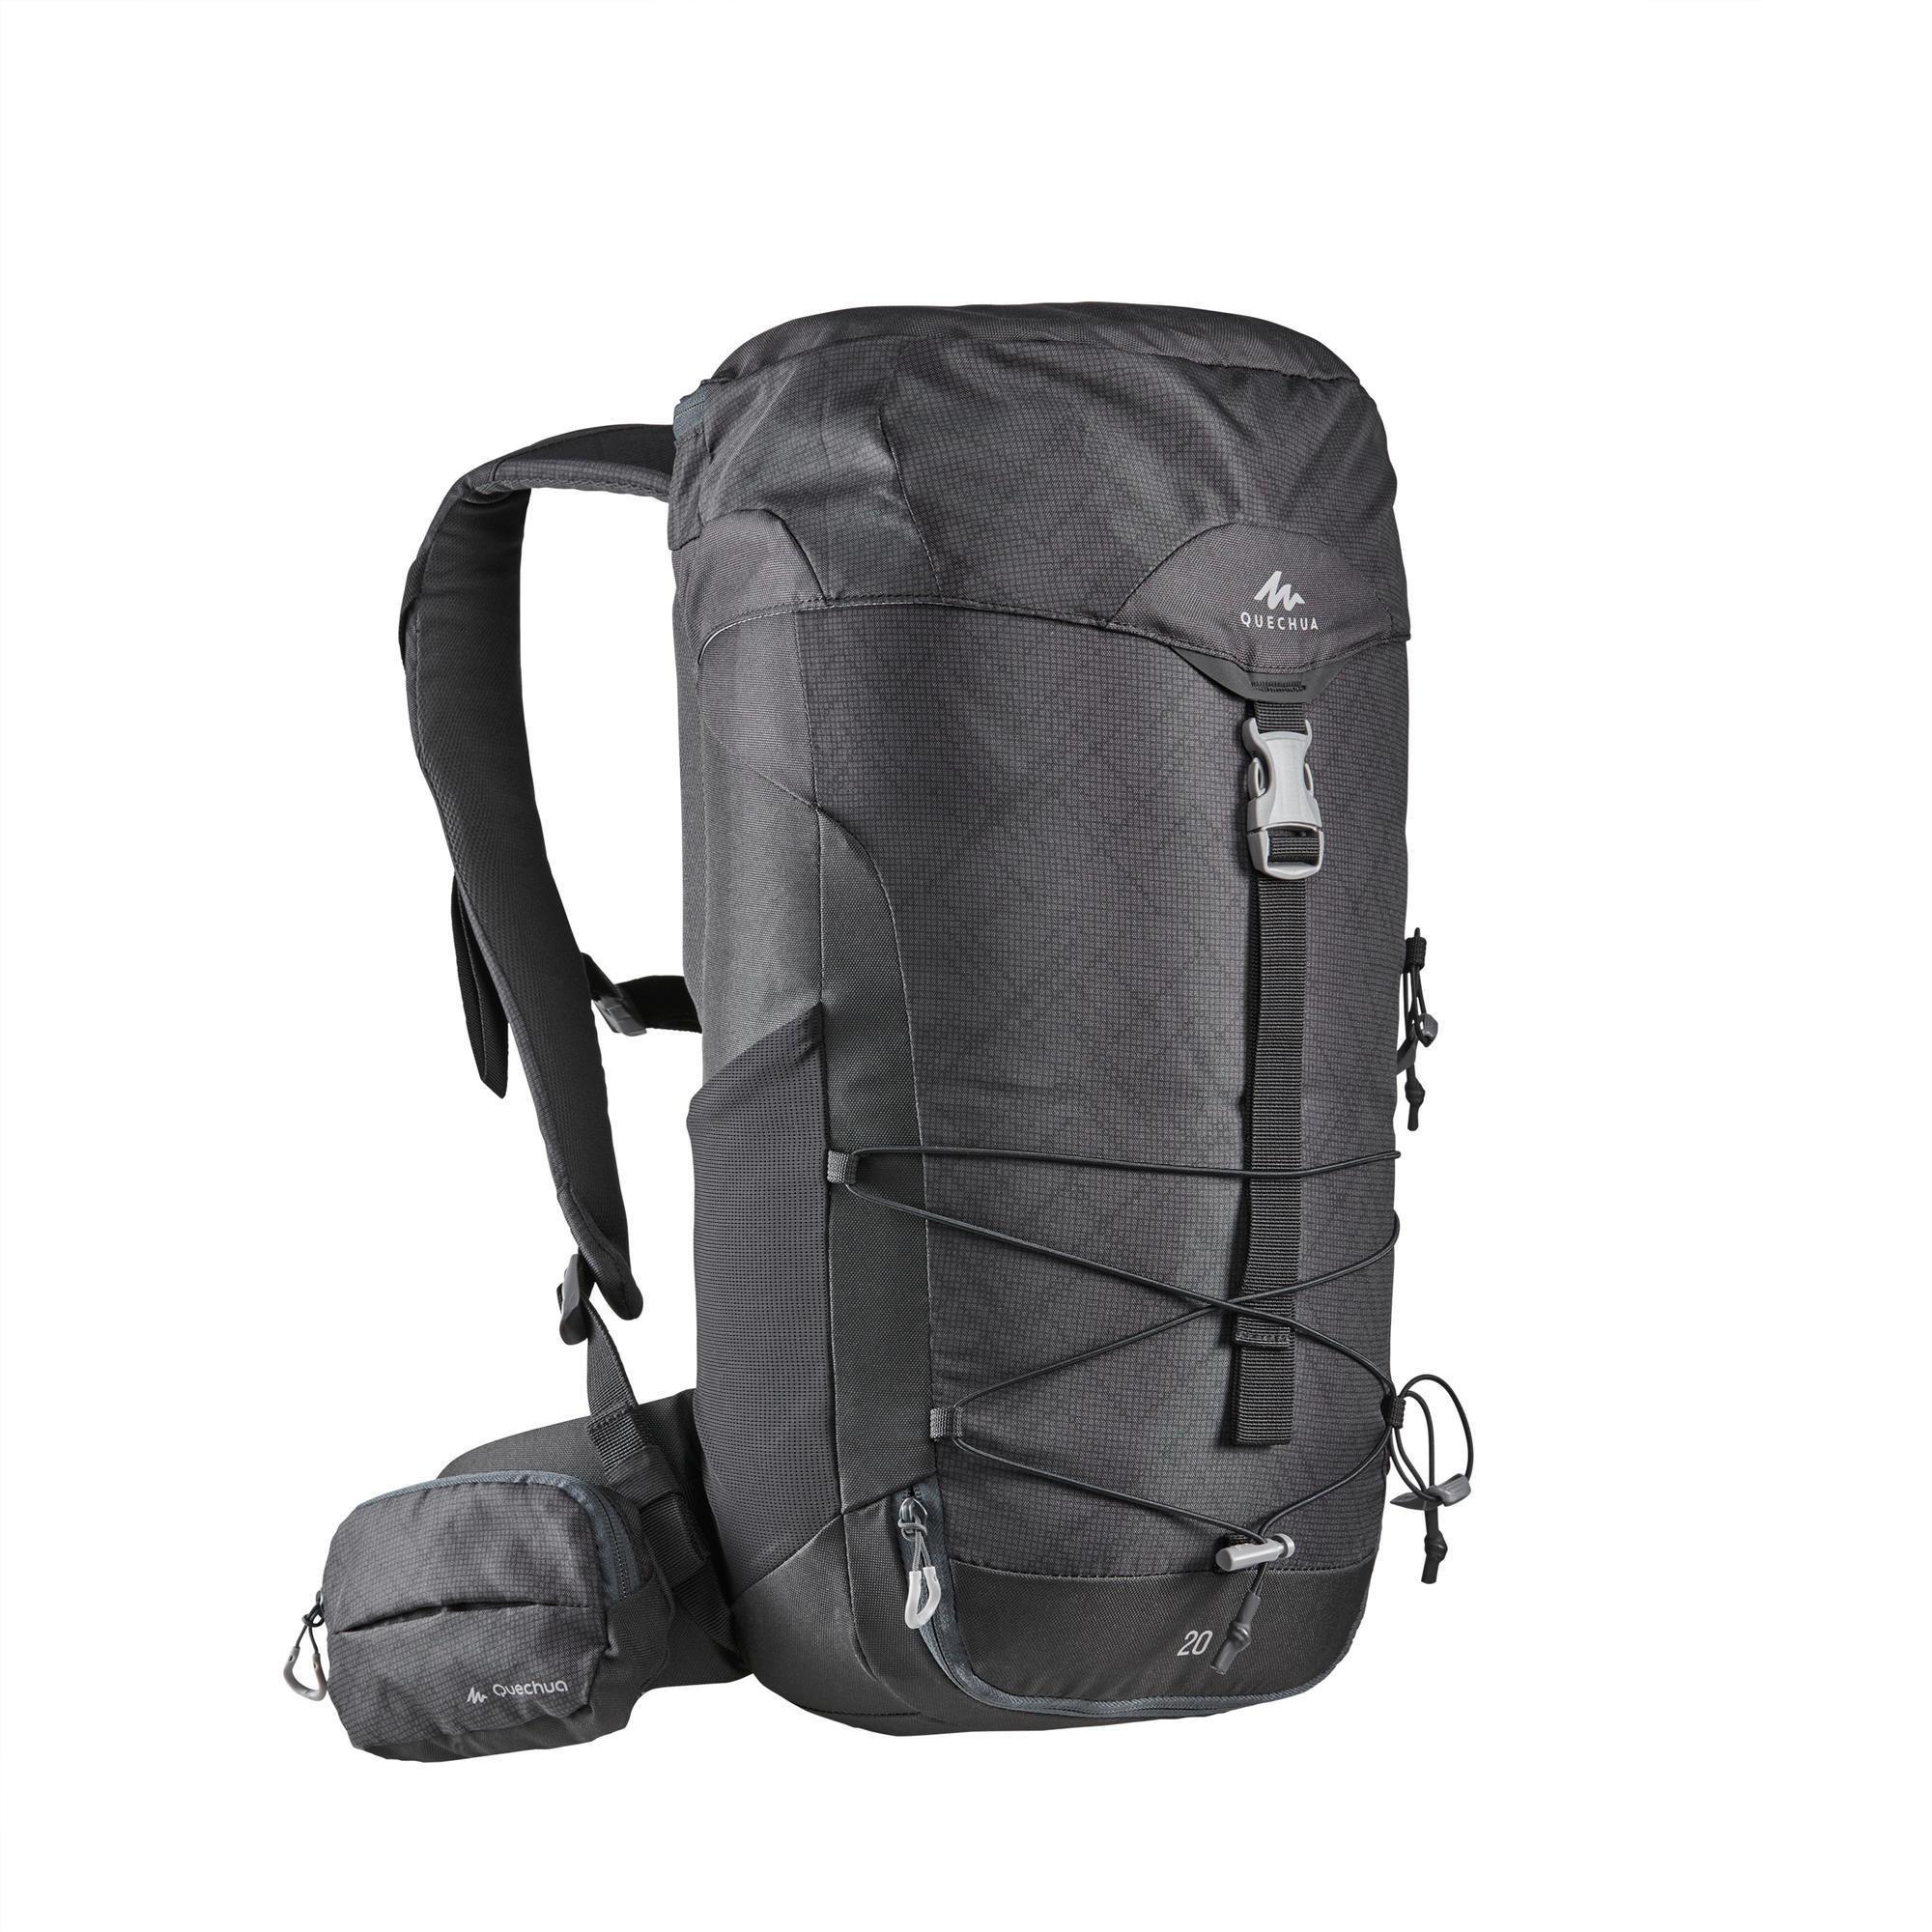 Plecak turystyczny - MH100 - 20 l